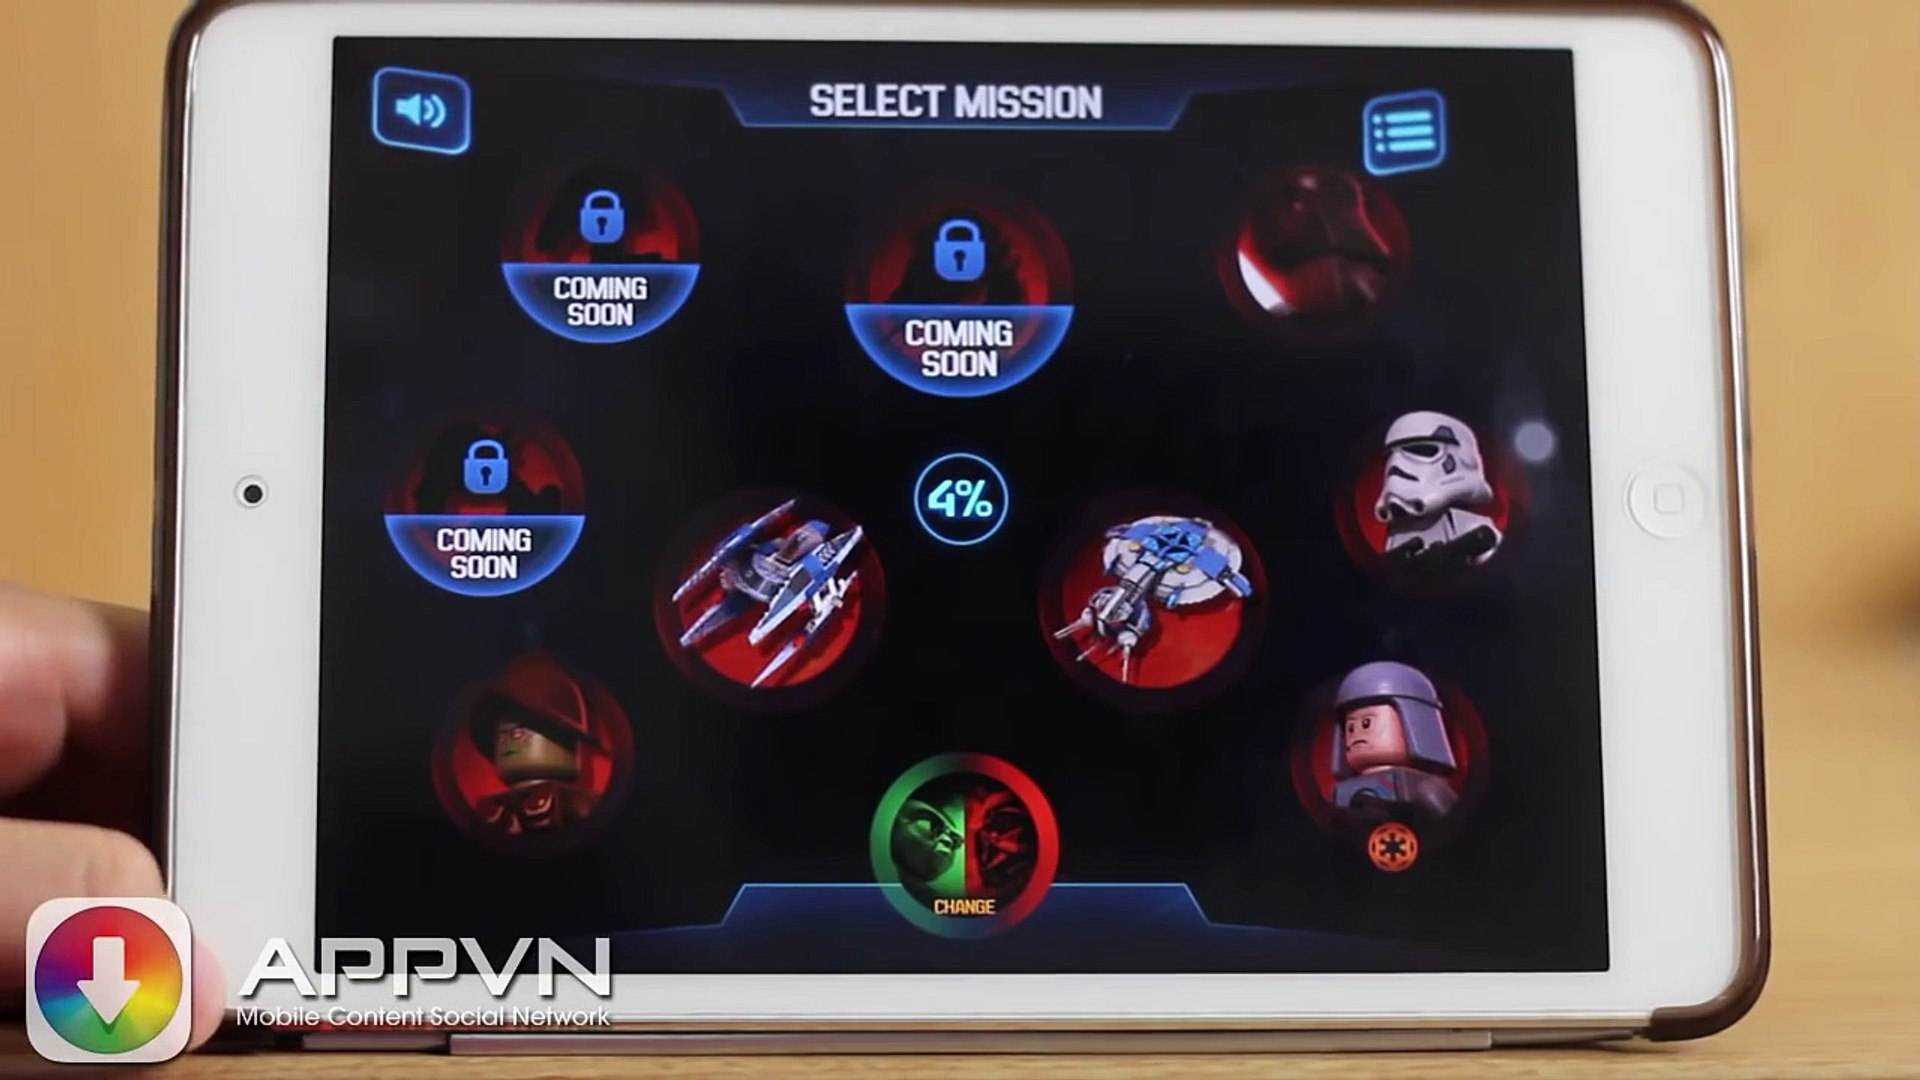 [iOS Game] LEGO® Star Wars™: Microfighters - Chiến tranh giữa các Lego - AppStoreVn